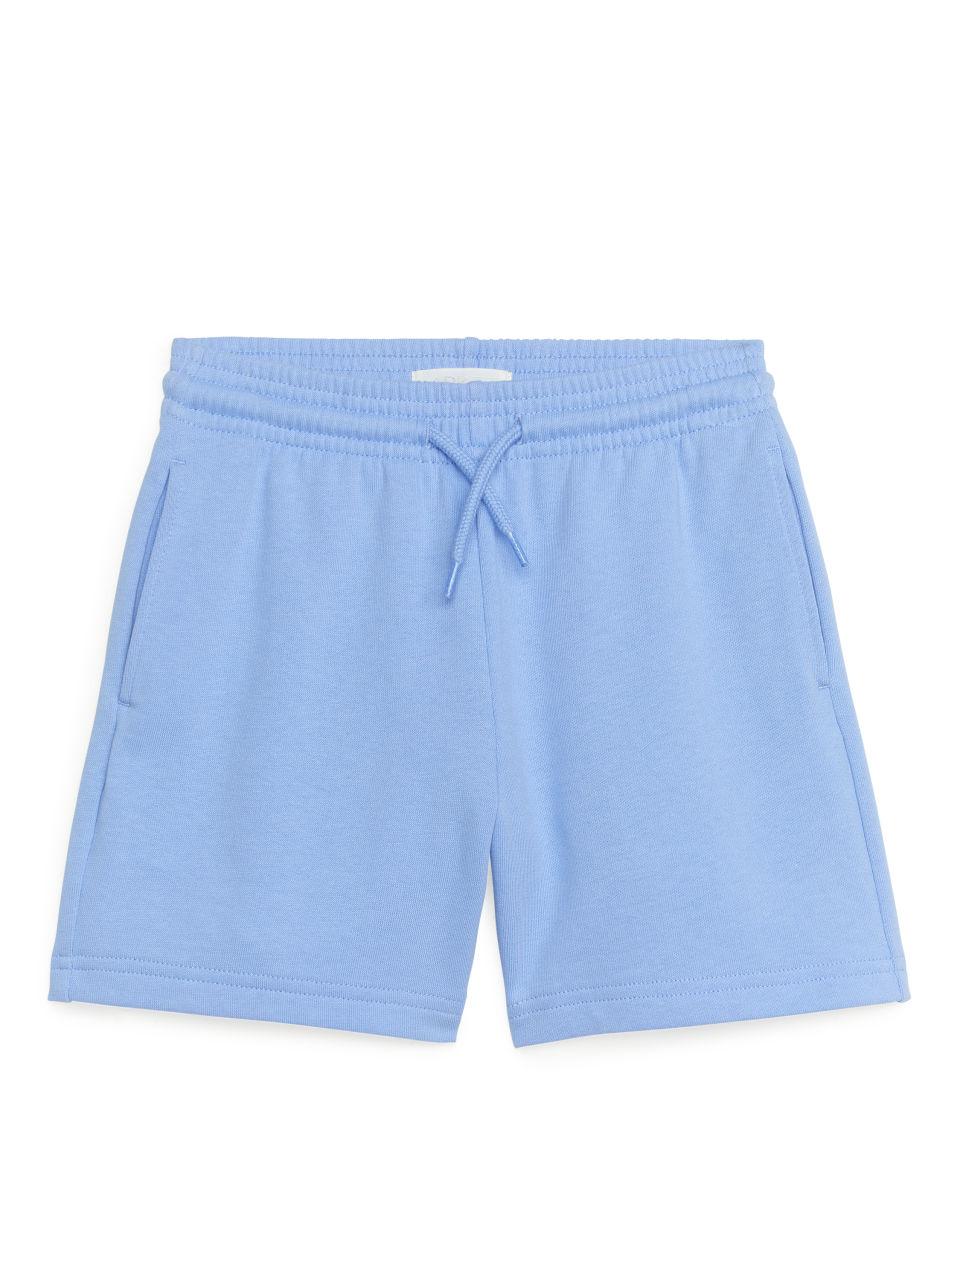 Sweatshirt Shorts - Blue